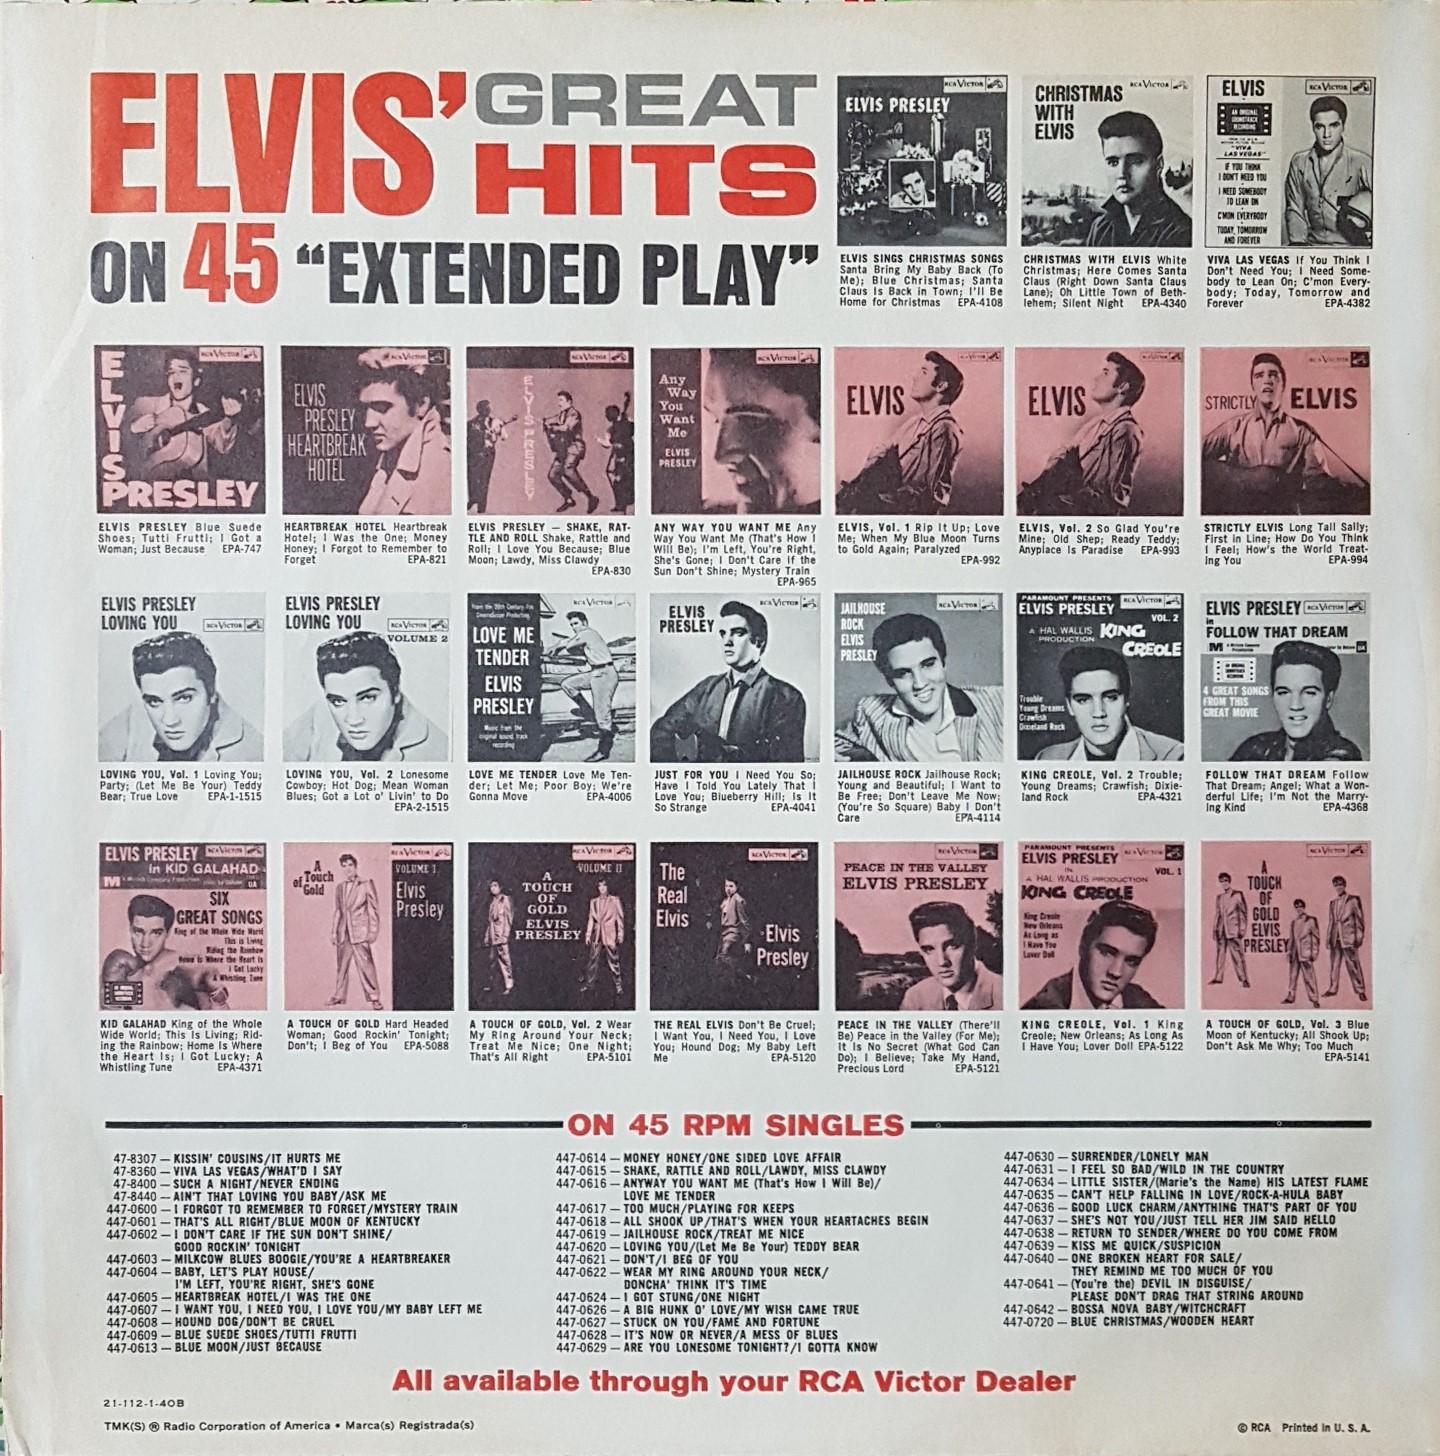 ELVIS' CHRISTMAS ALBUM 20200324_175903r3j81